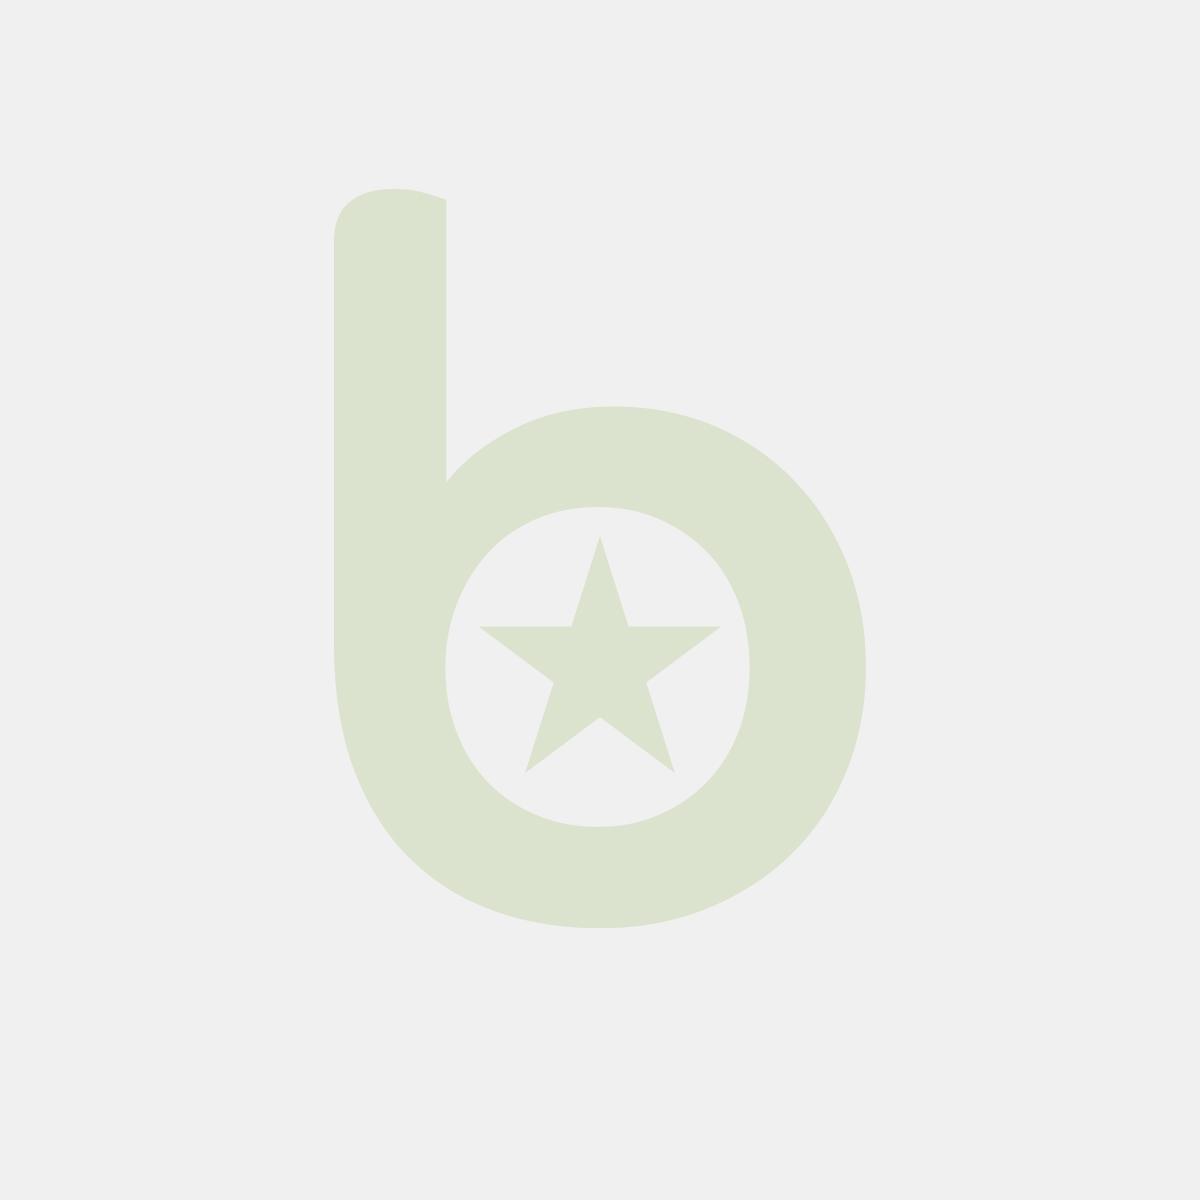 Tacka brązowa BURGER, FRYTKI 20x9x2,5cm TnG op. 100 sztuk